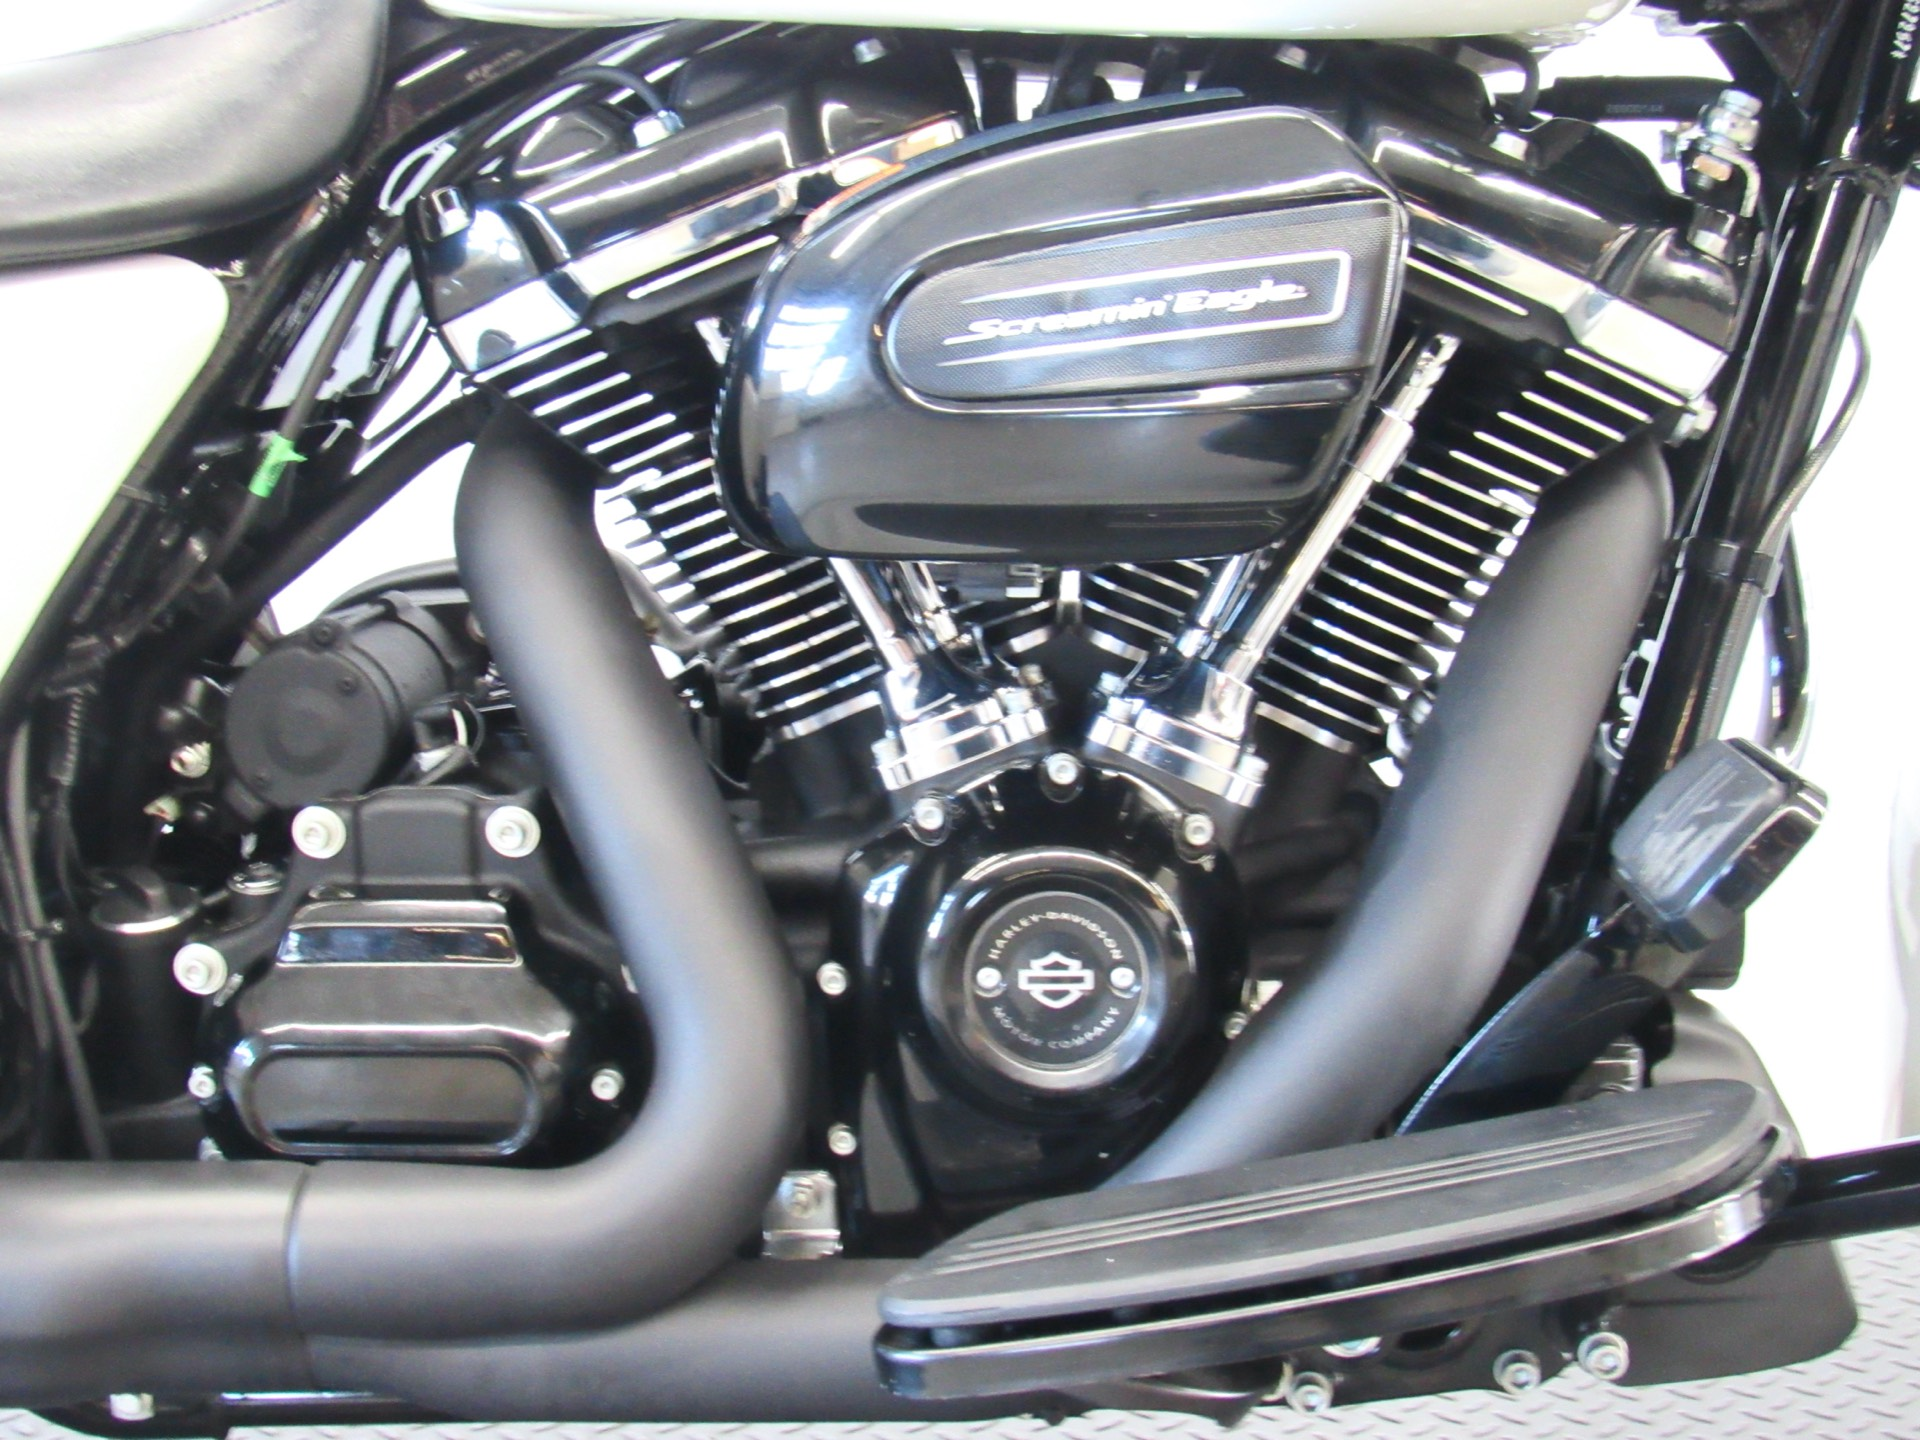 Used 2018 Harley Davidson Road Glide Special Bonneville Salt Pearl Motorcycles In Fredericksburg Va 10037